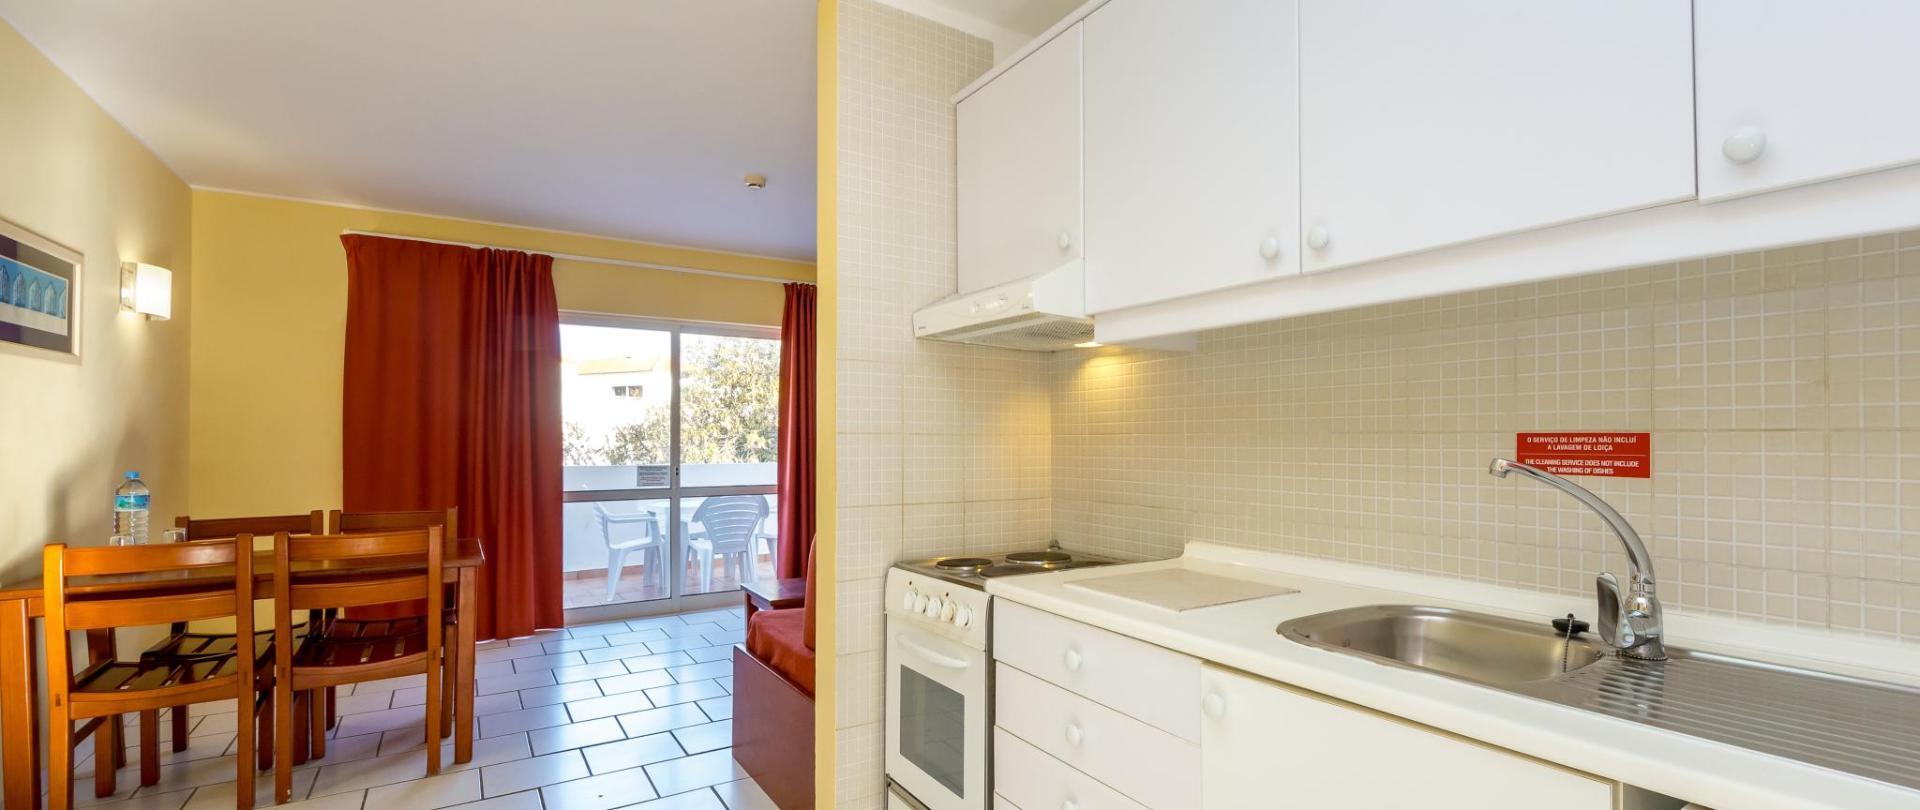 Pateo Village - Apartamento T1 A-3.jpg